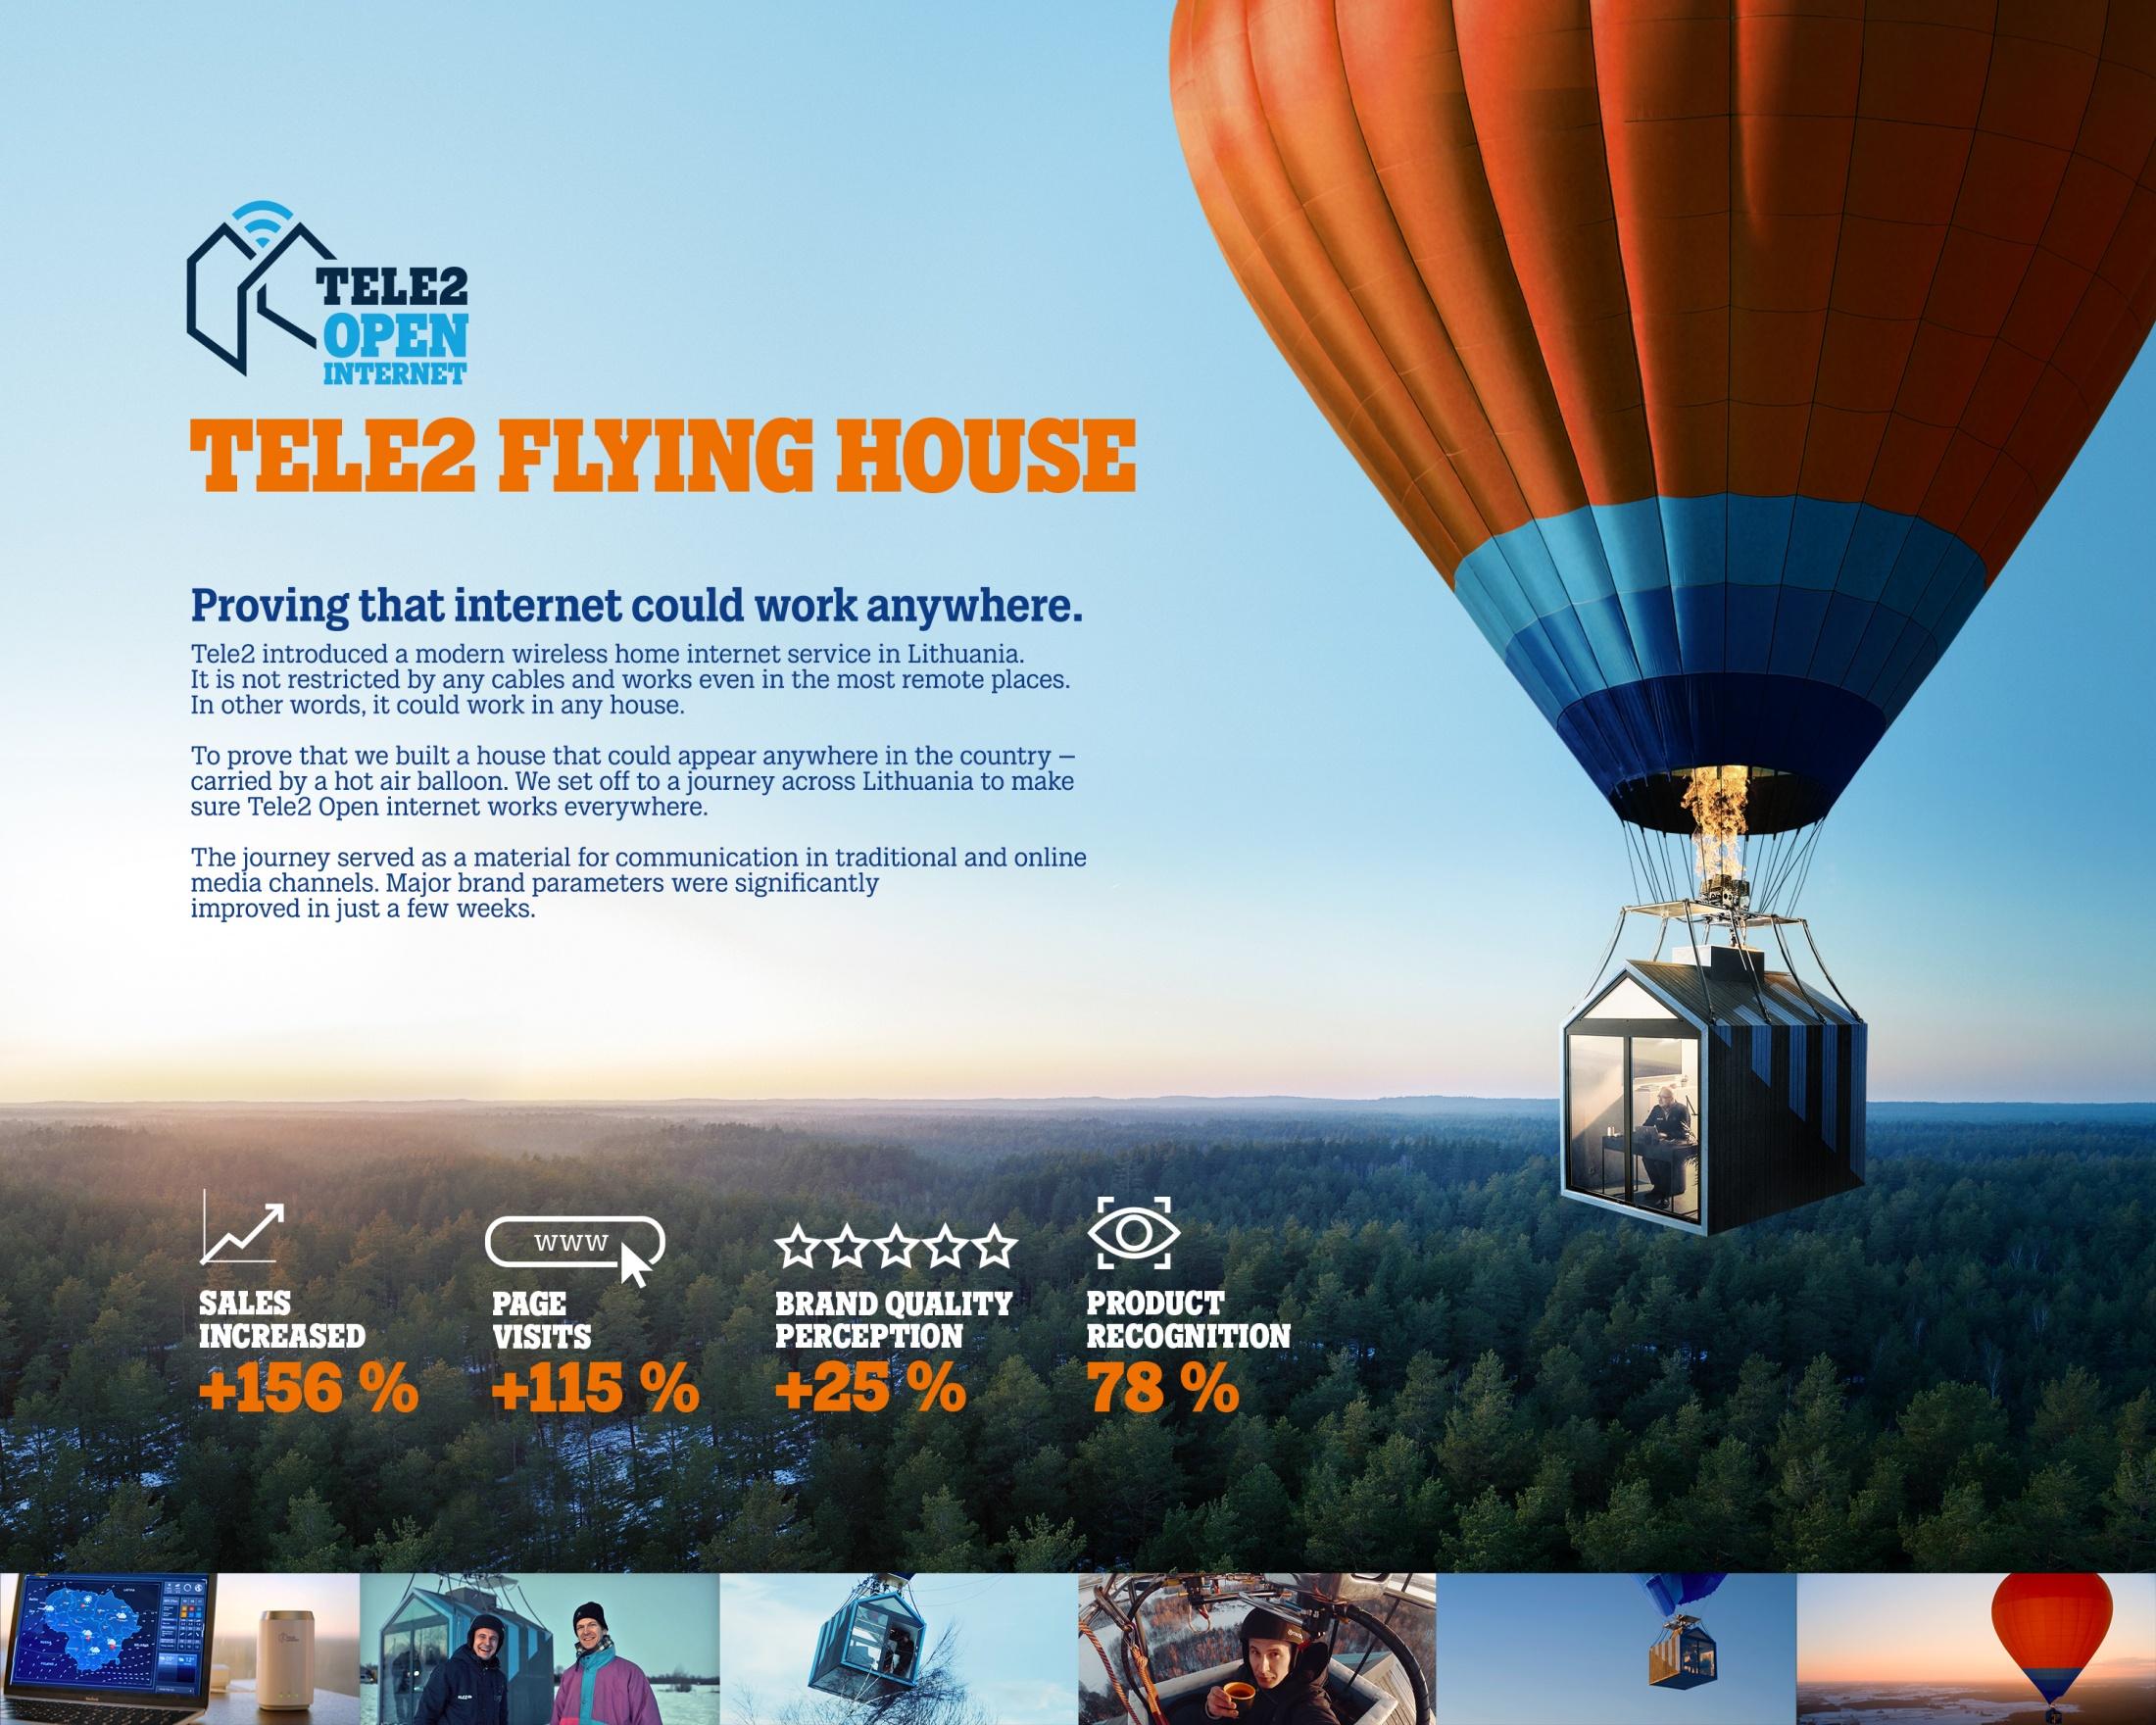 Thumbnail for FLYING HOUSE